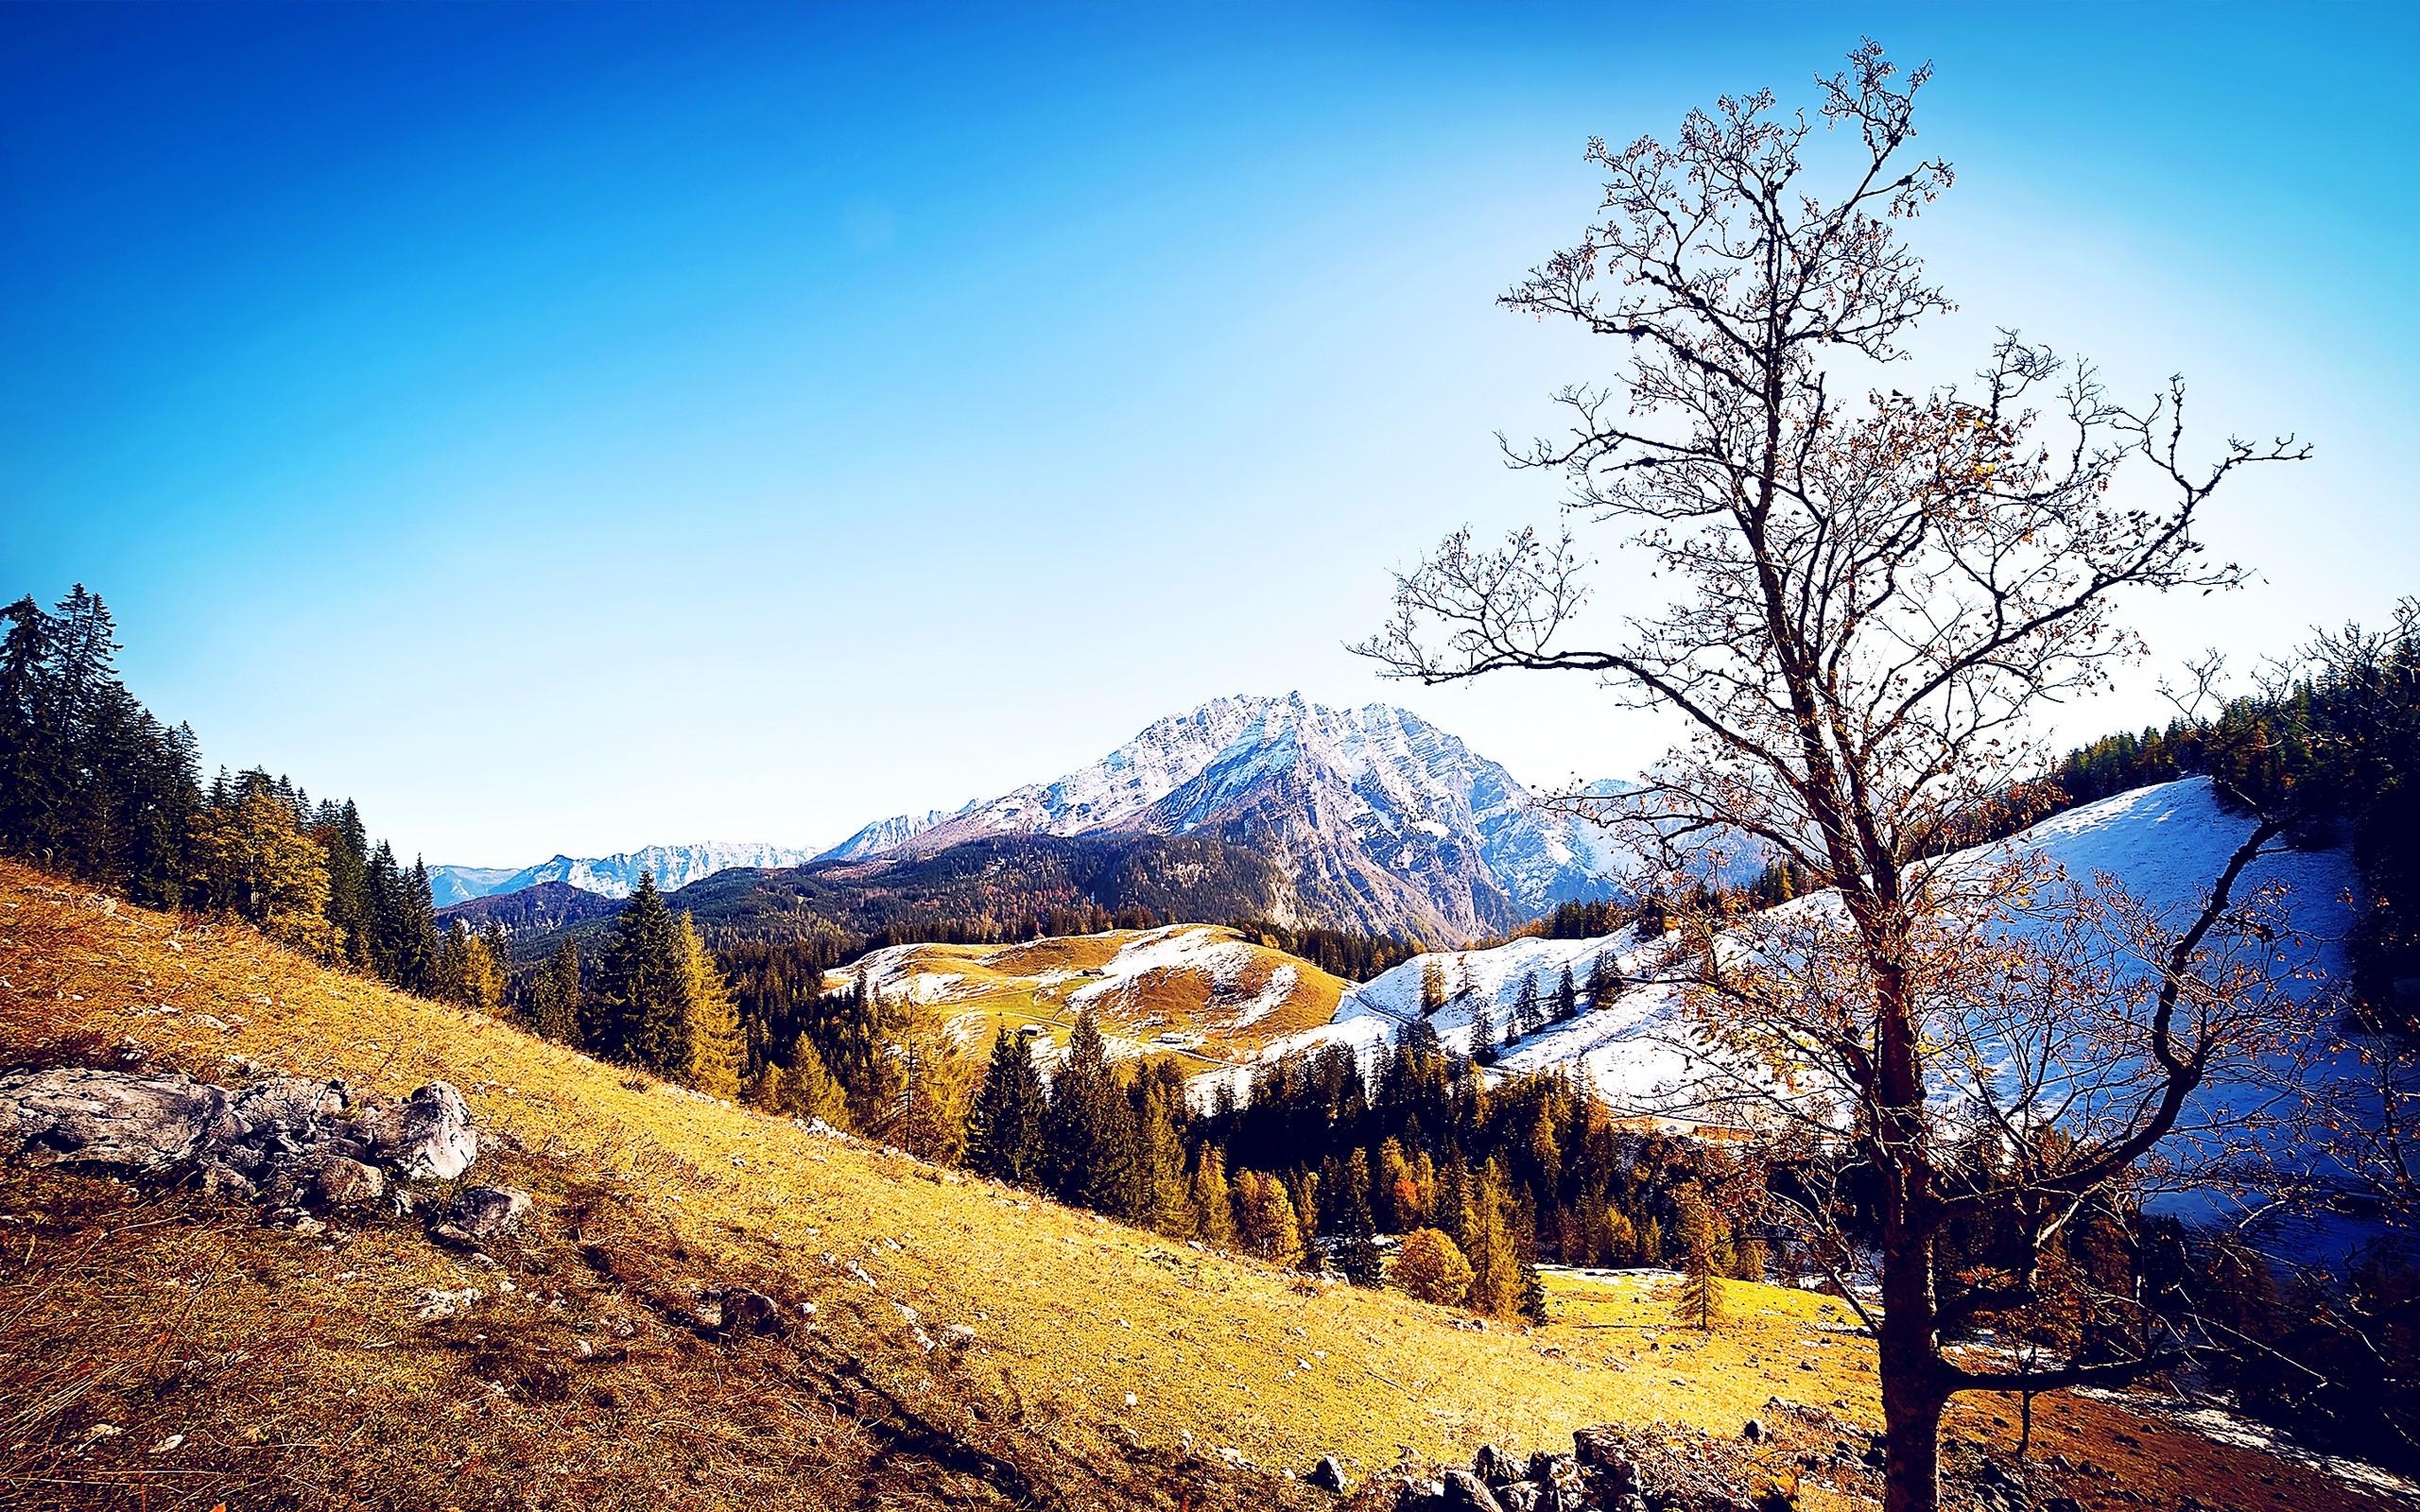 Wallpaper Mountains in autumn